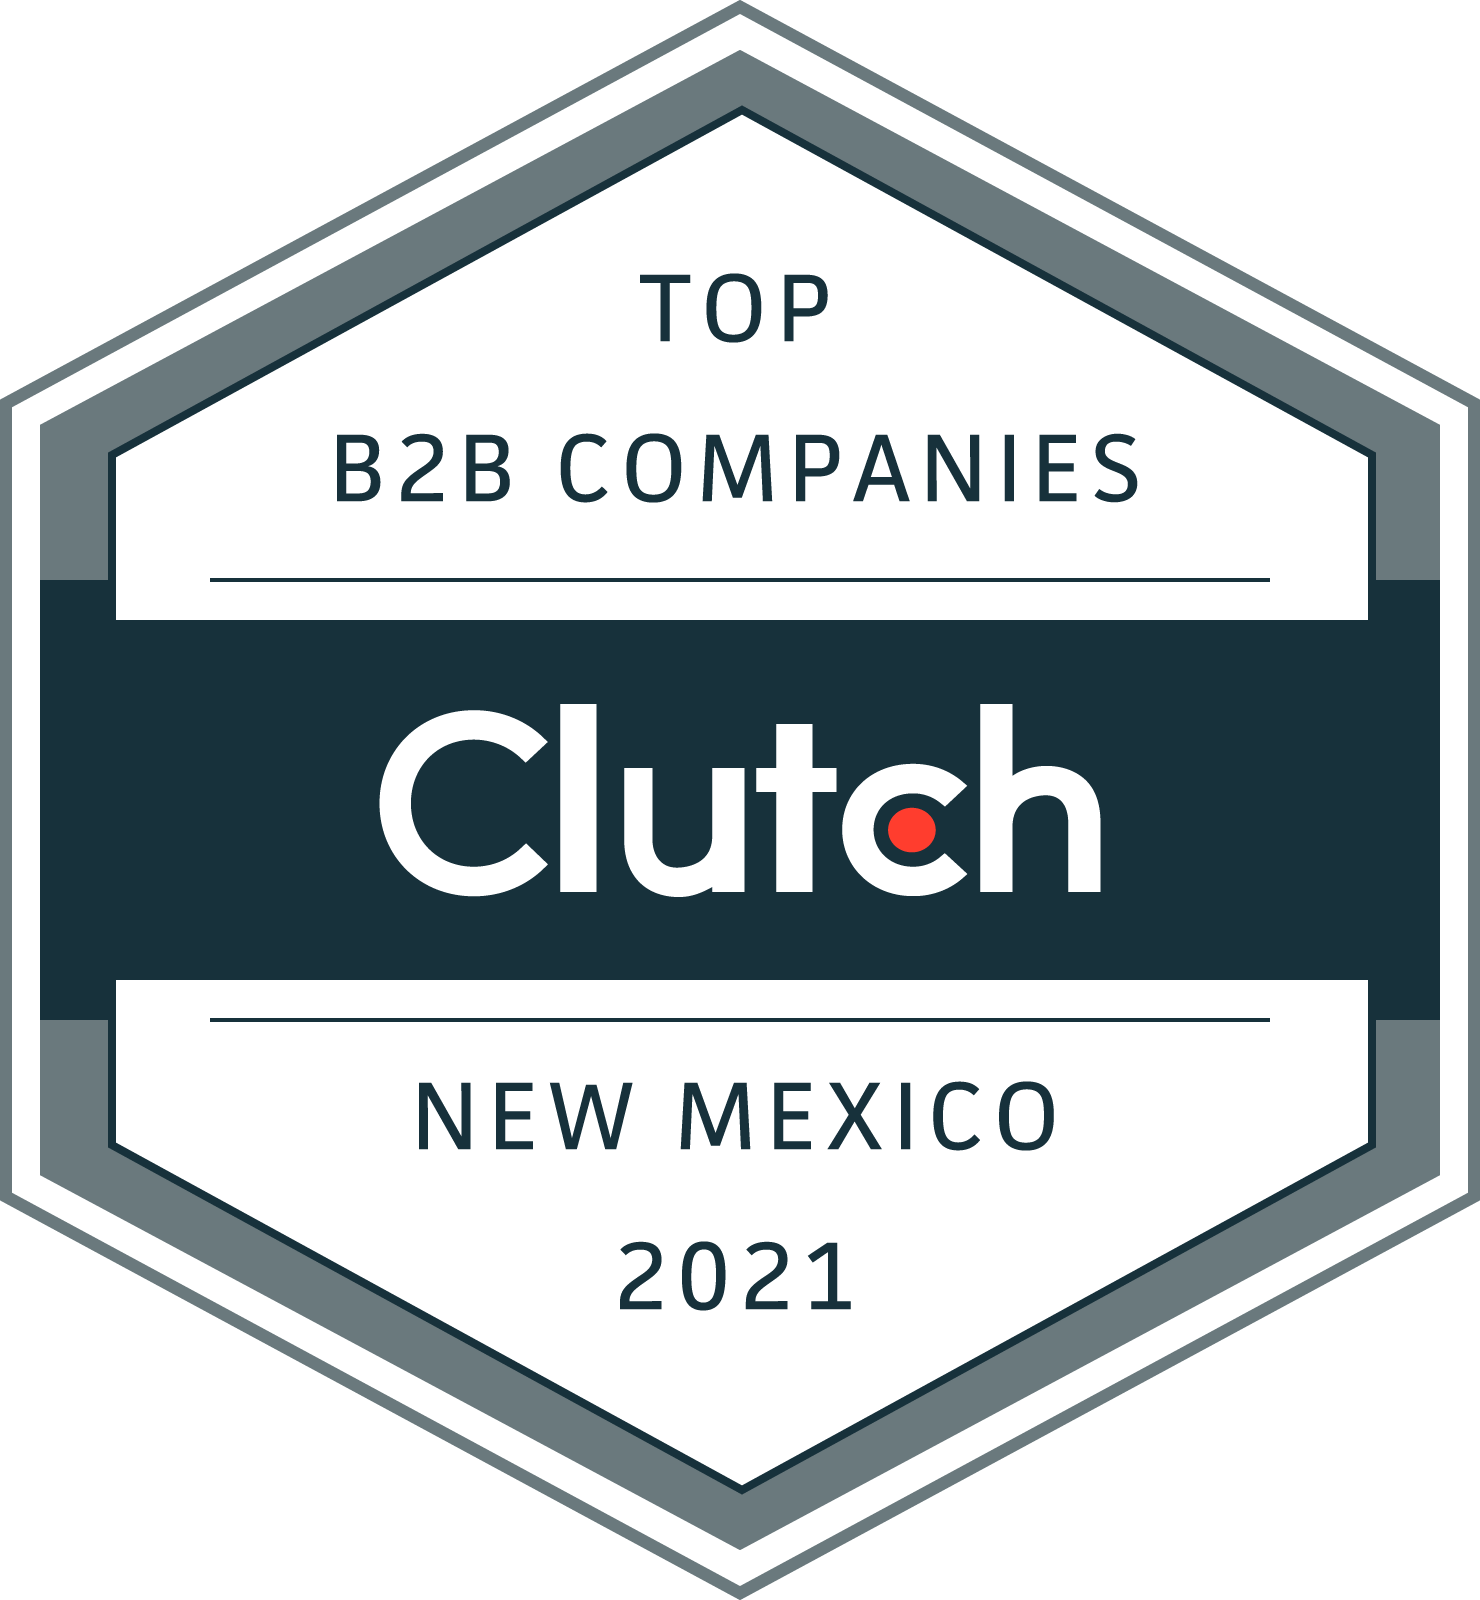 New Mexico B2B Leaders Award Badge